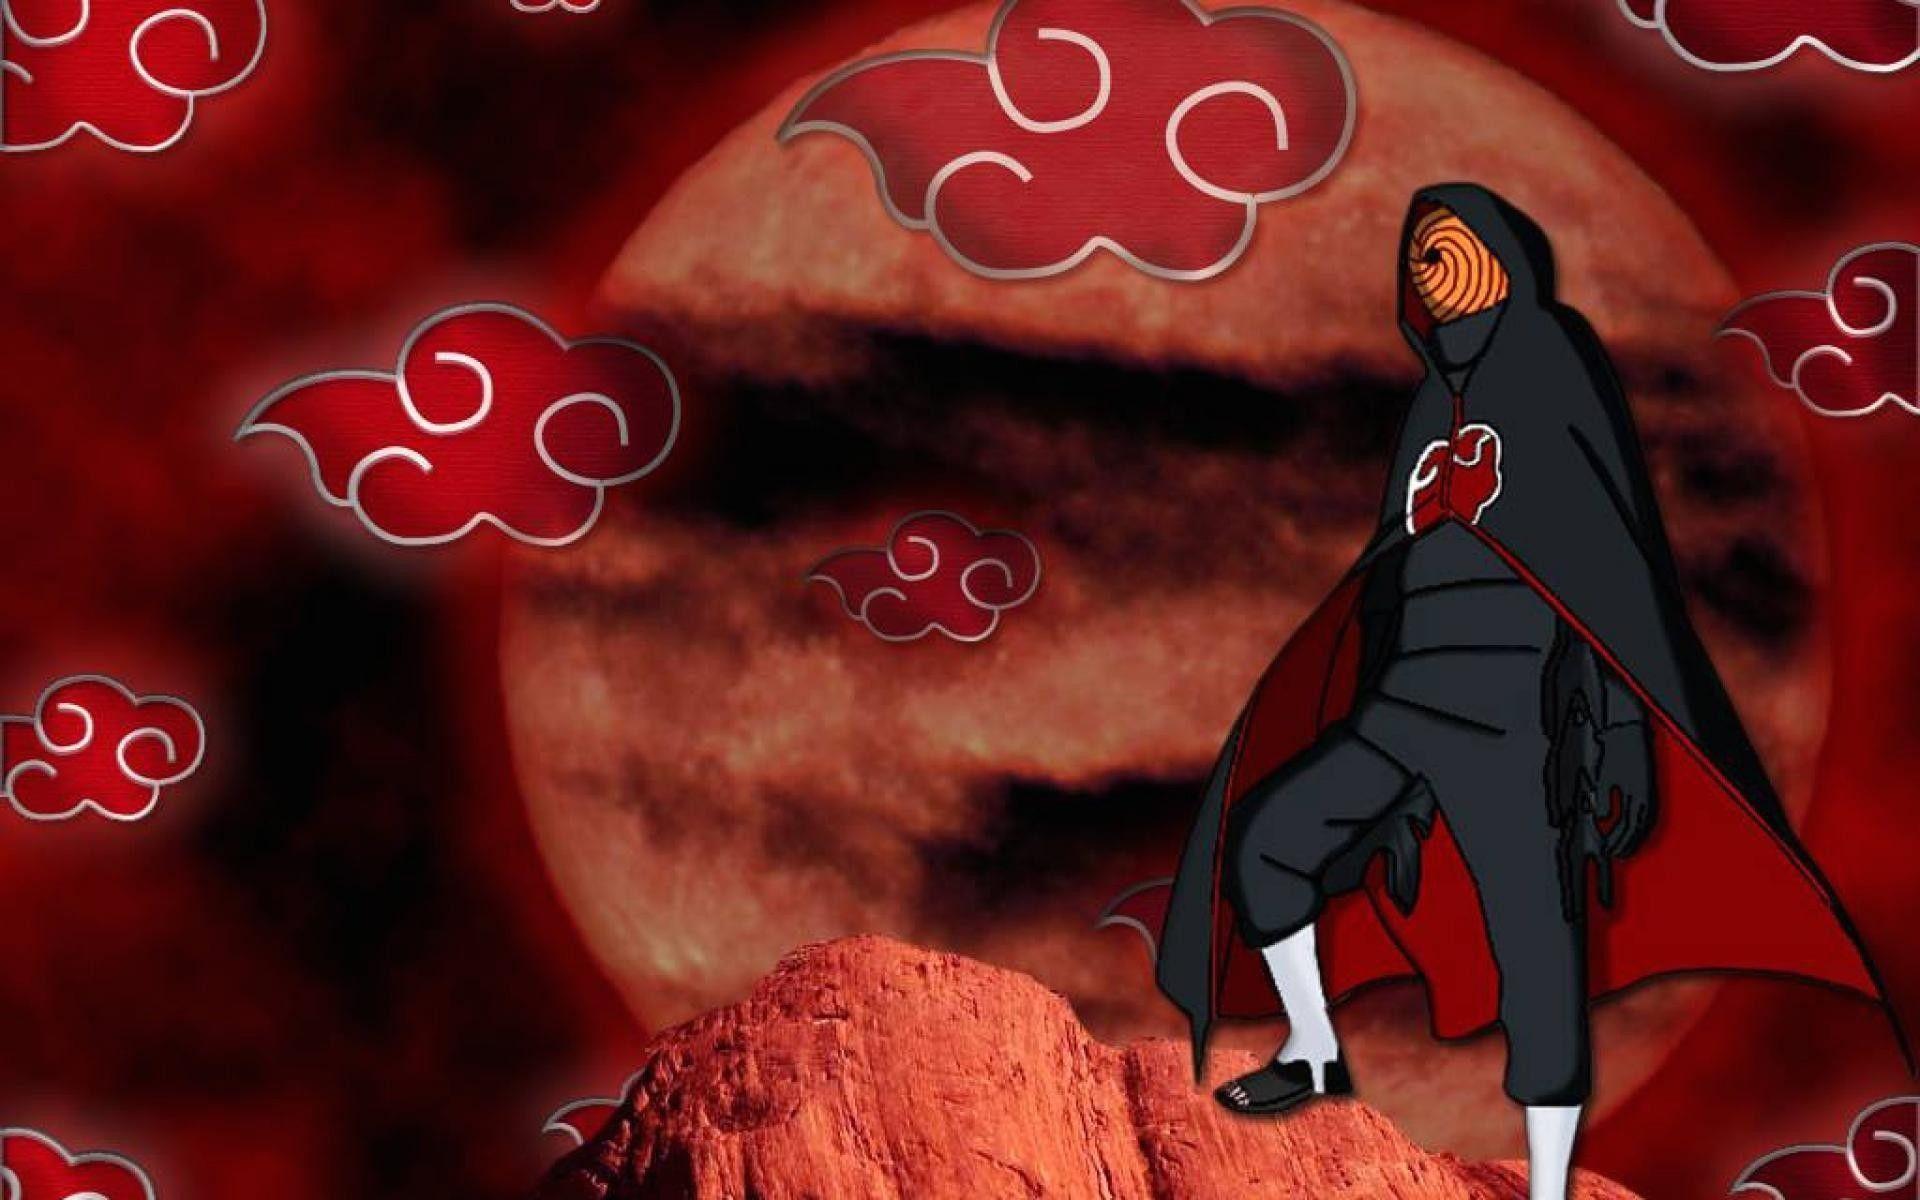 Akatsuki Wallpaper Inspirational Naruto Tobi Wallpaper 58 Images